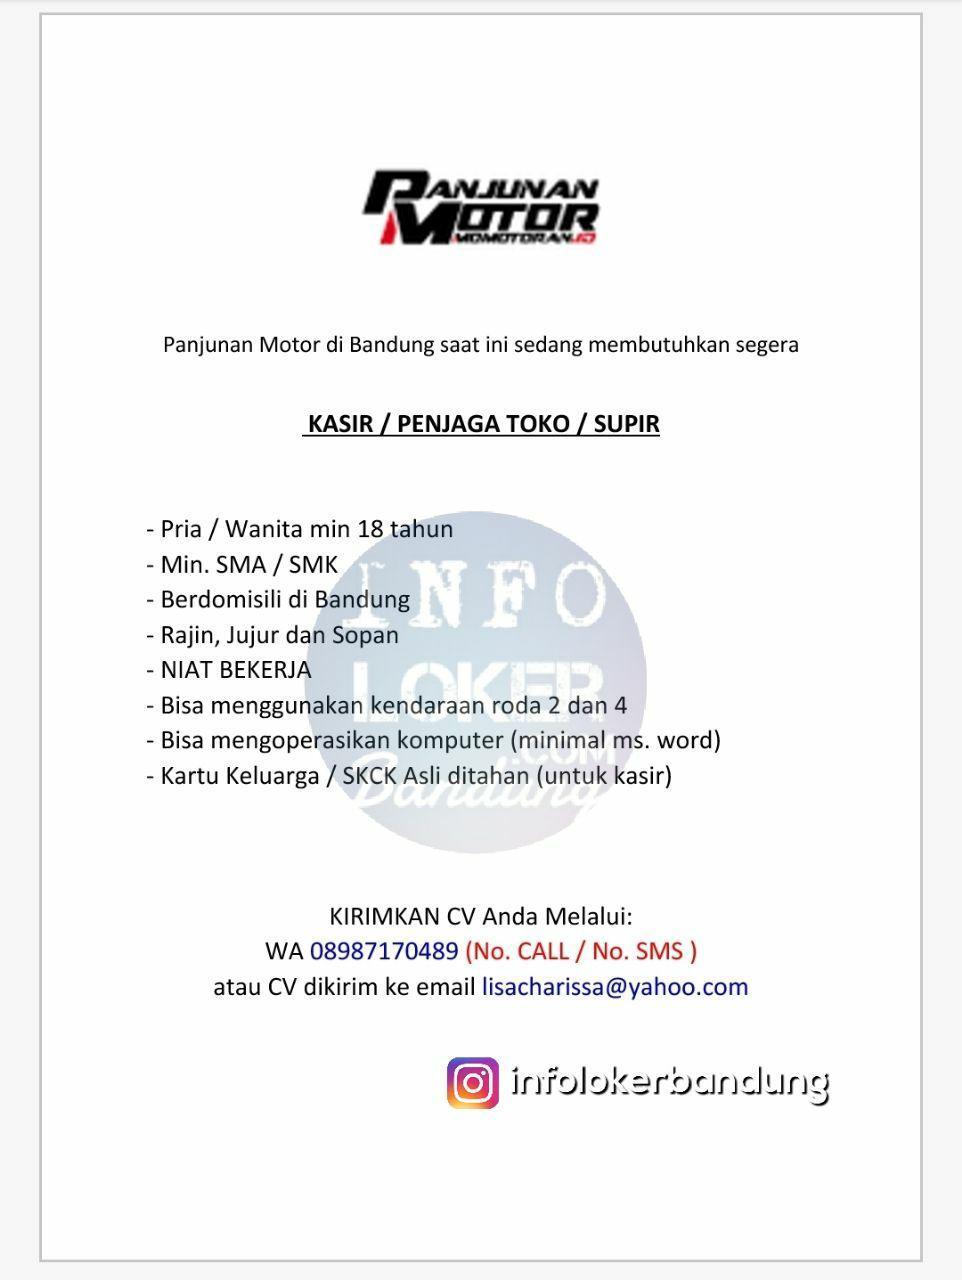 Lowongan Kerja Panjunan Motor Bandung April 2018